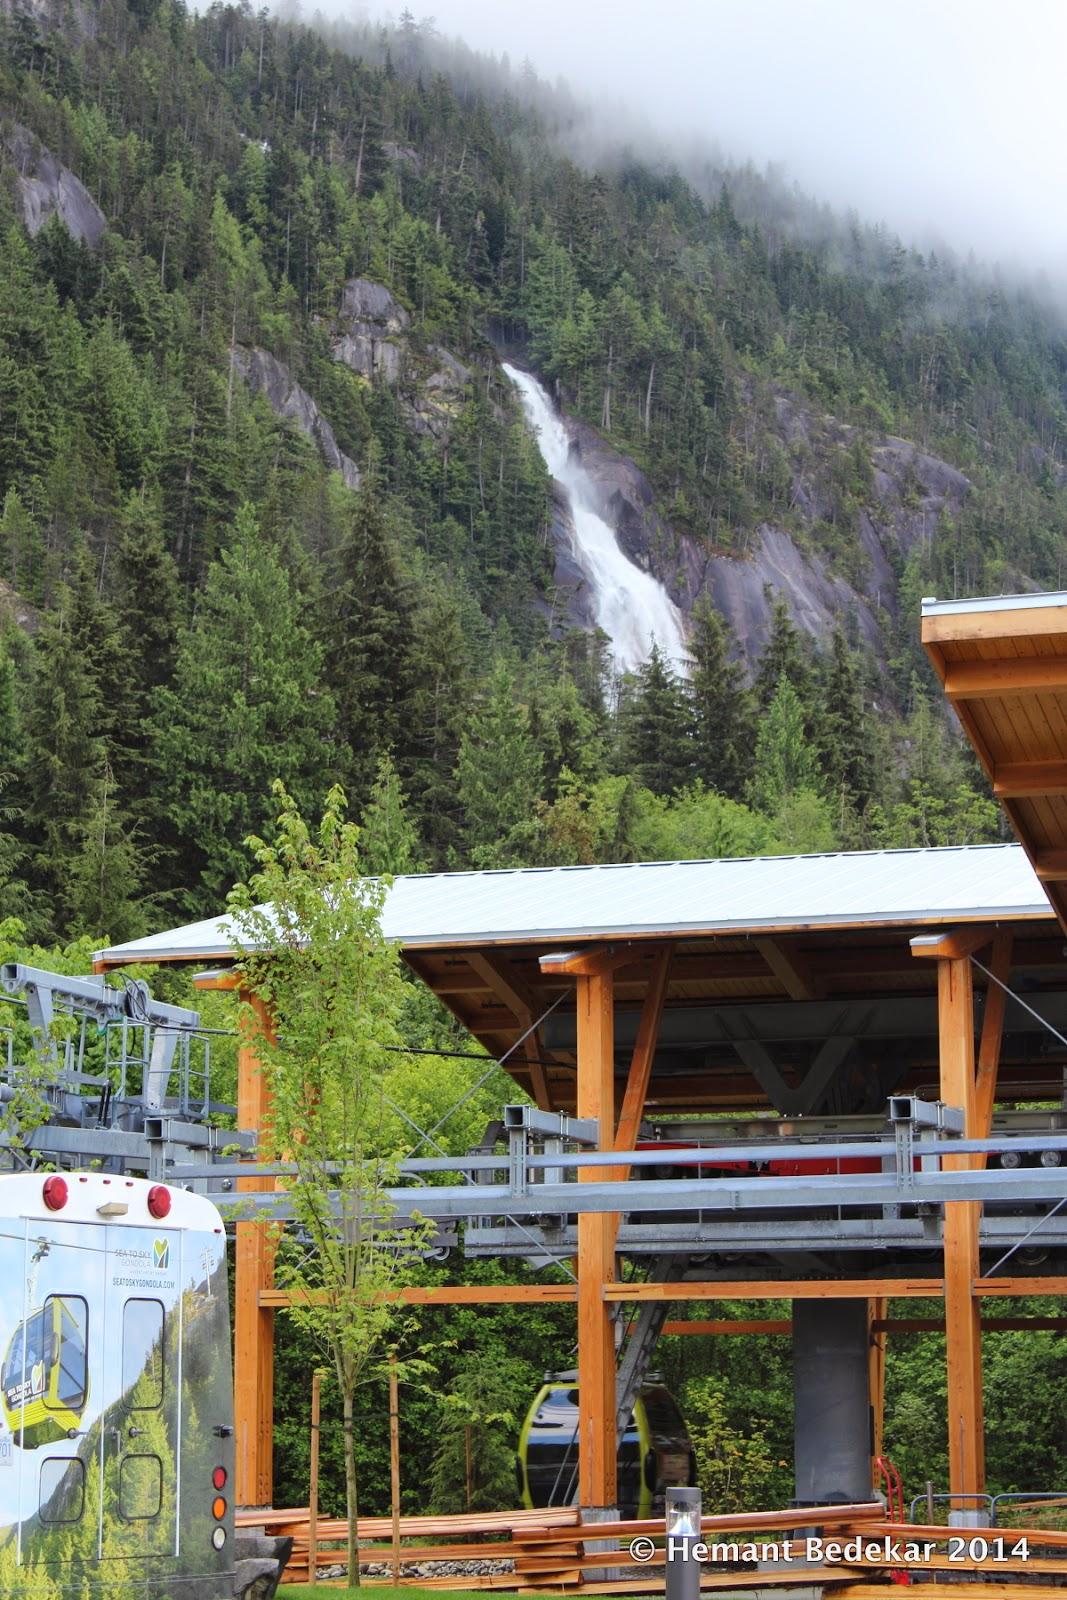 Shannon Falls in Squamish